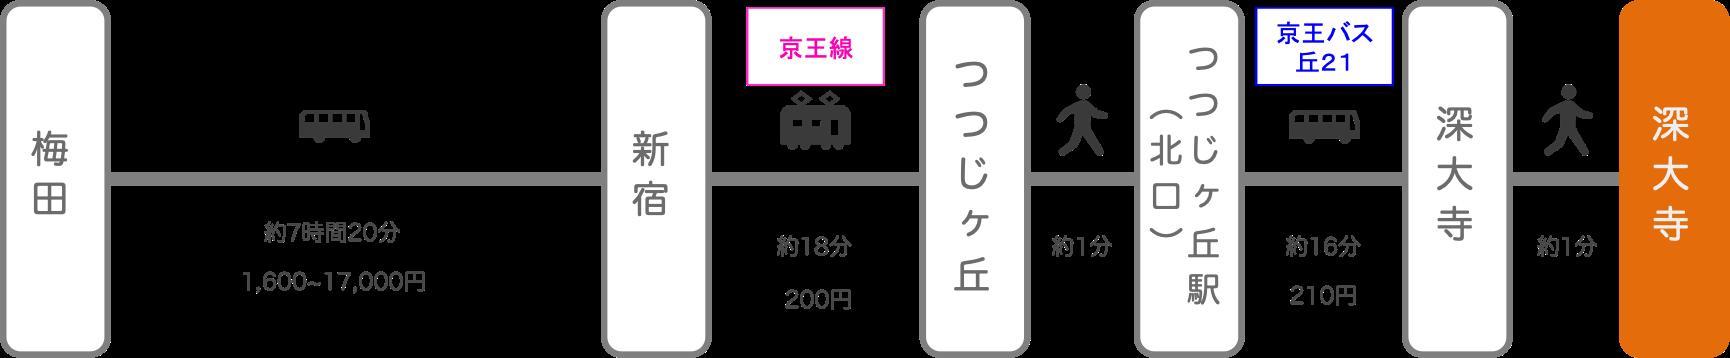 深大寺_大阪_高速バス